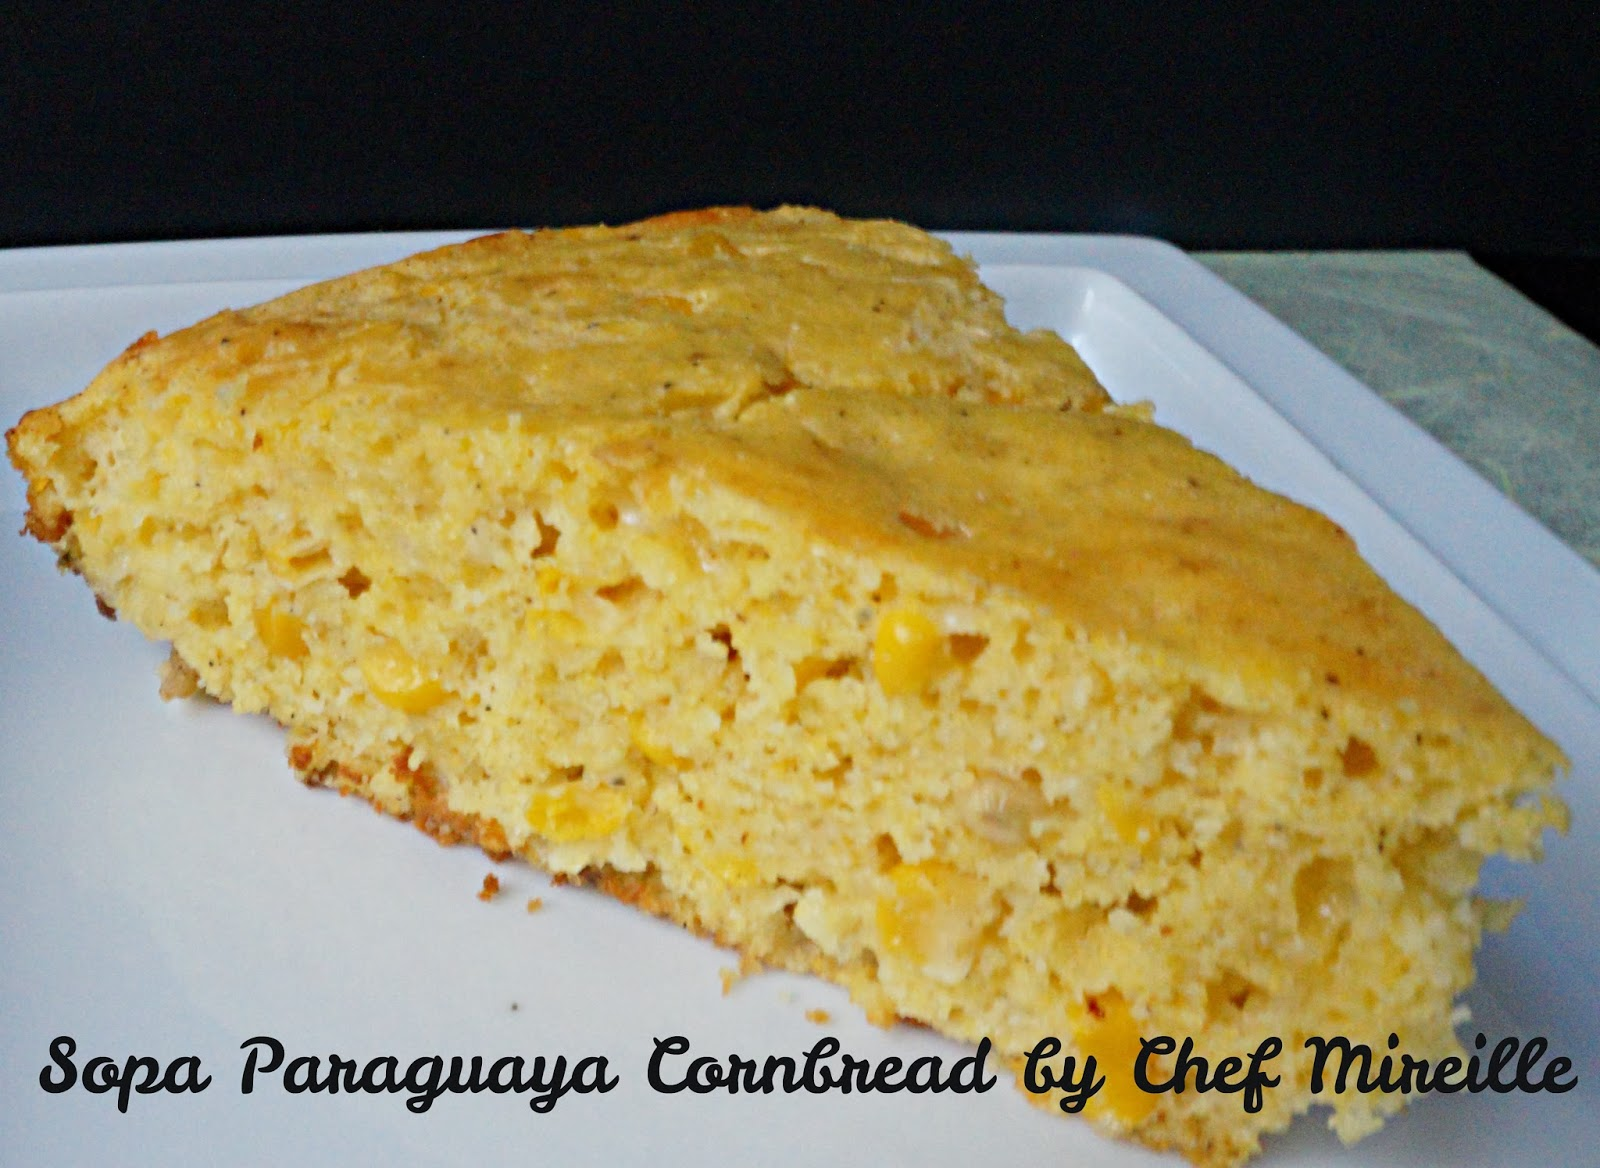 sopa paraguaya cornbread